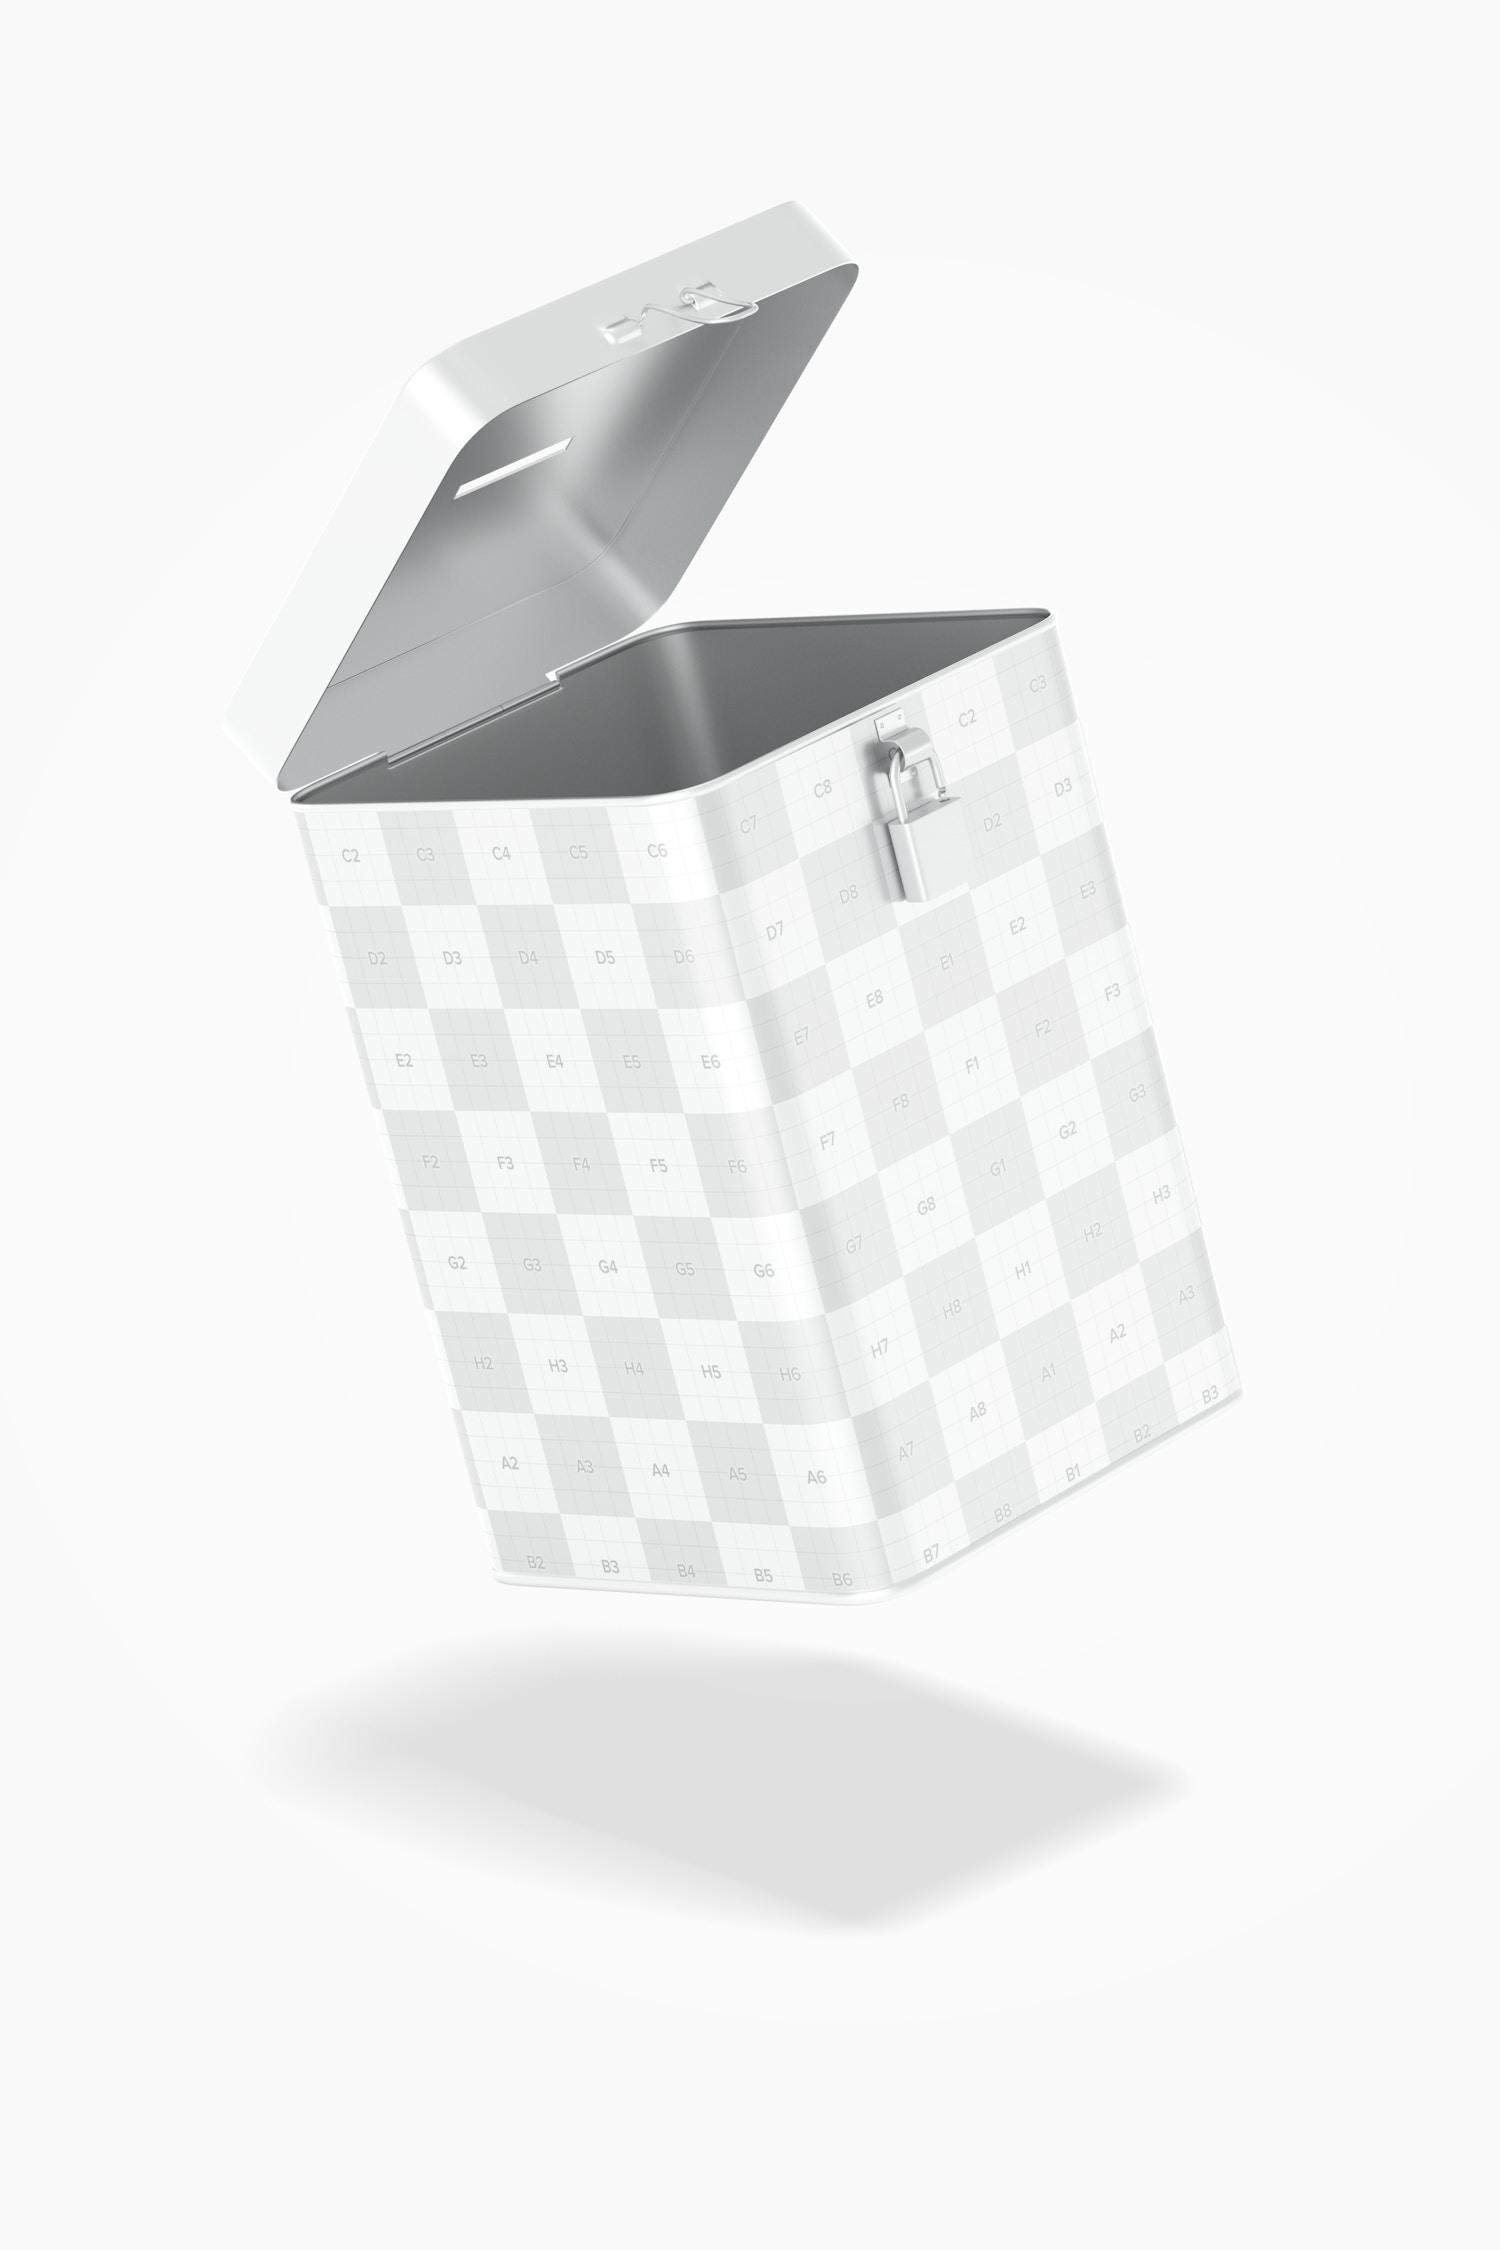 Metal Rectangular Moneybox Mockup, Floating